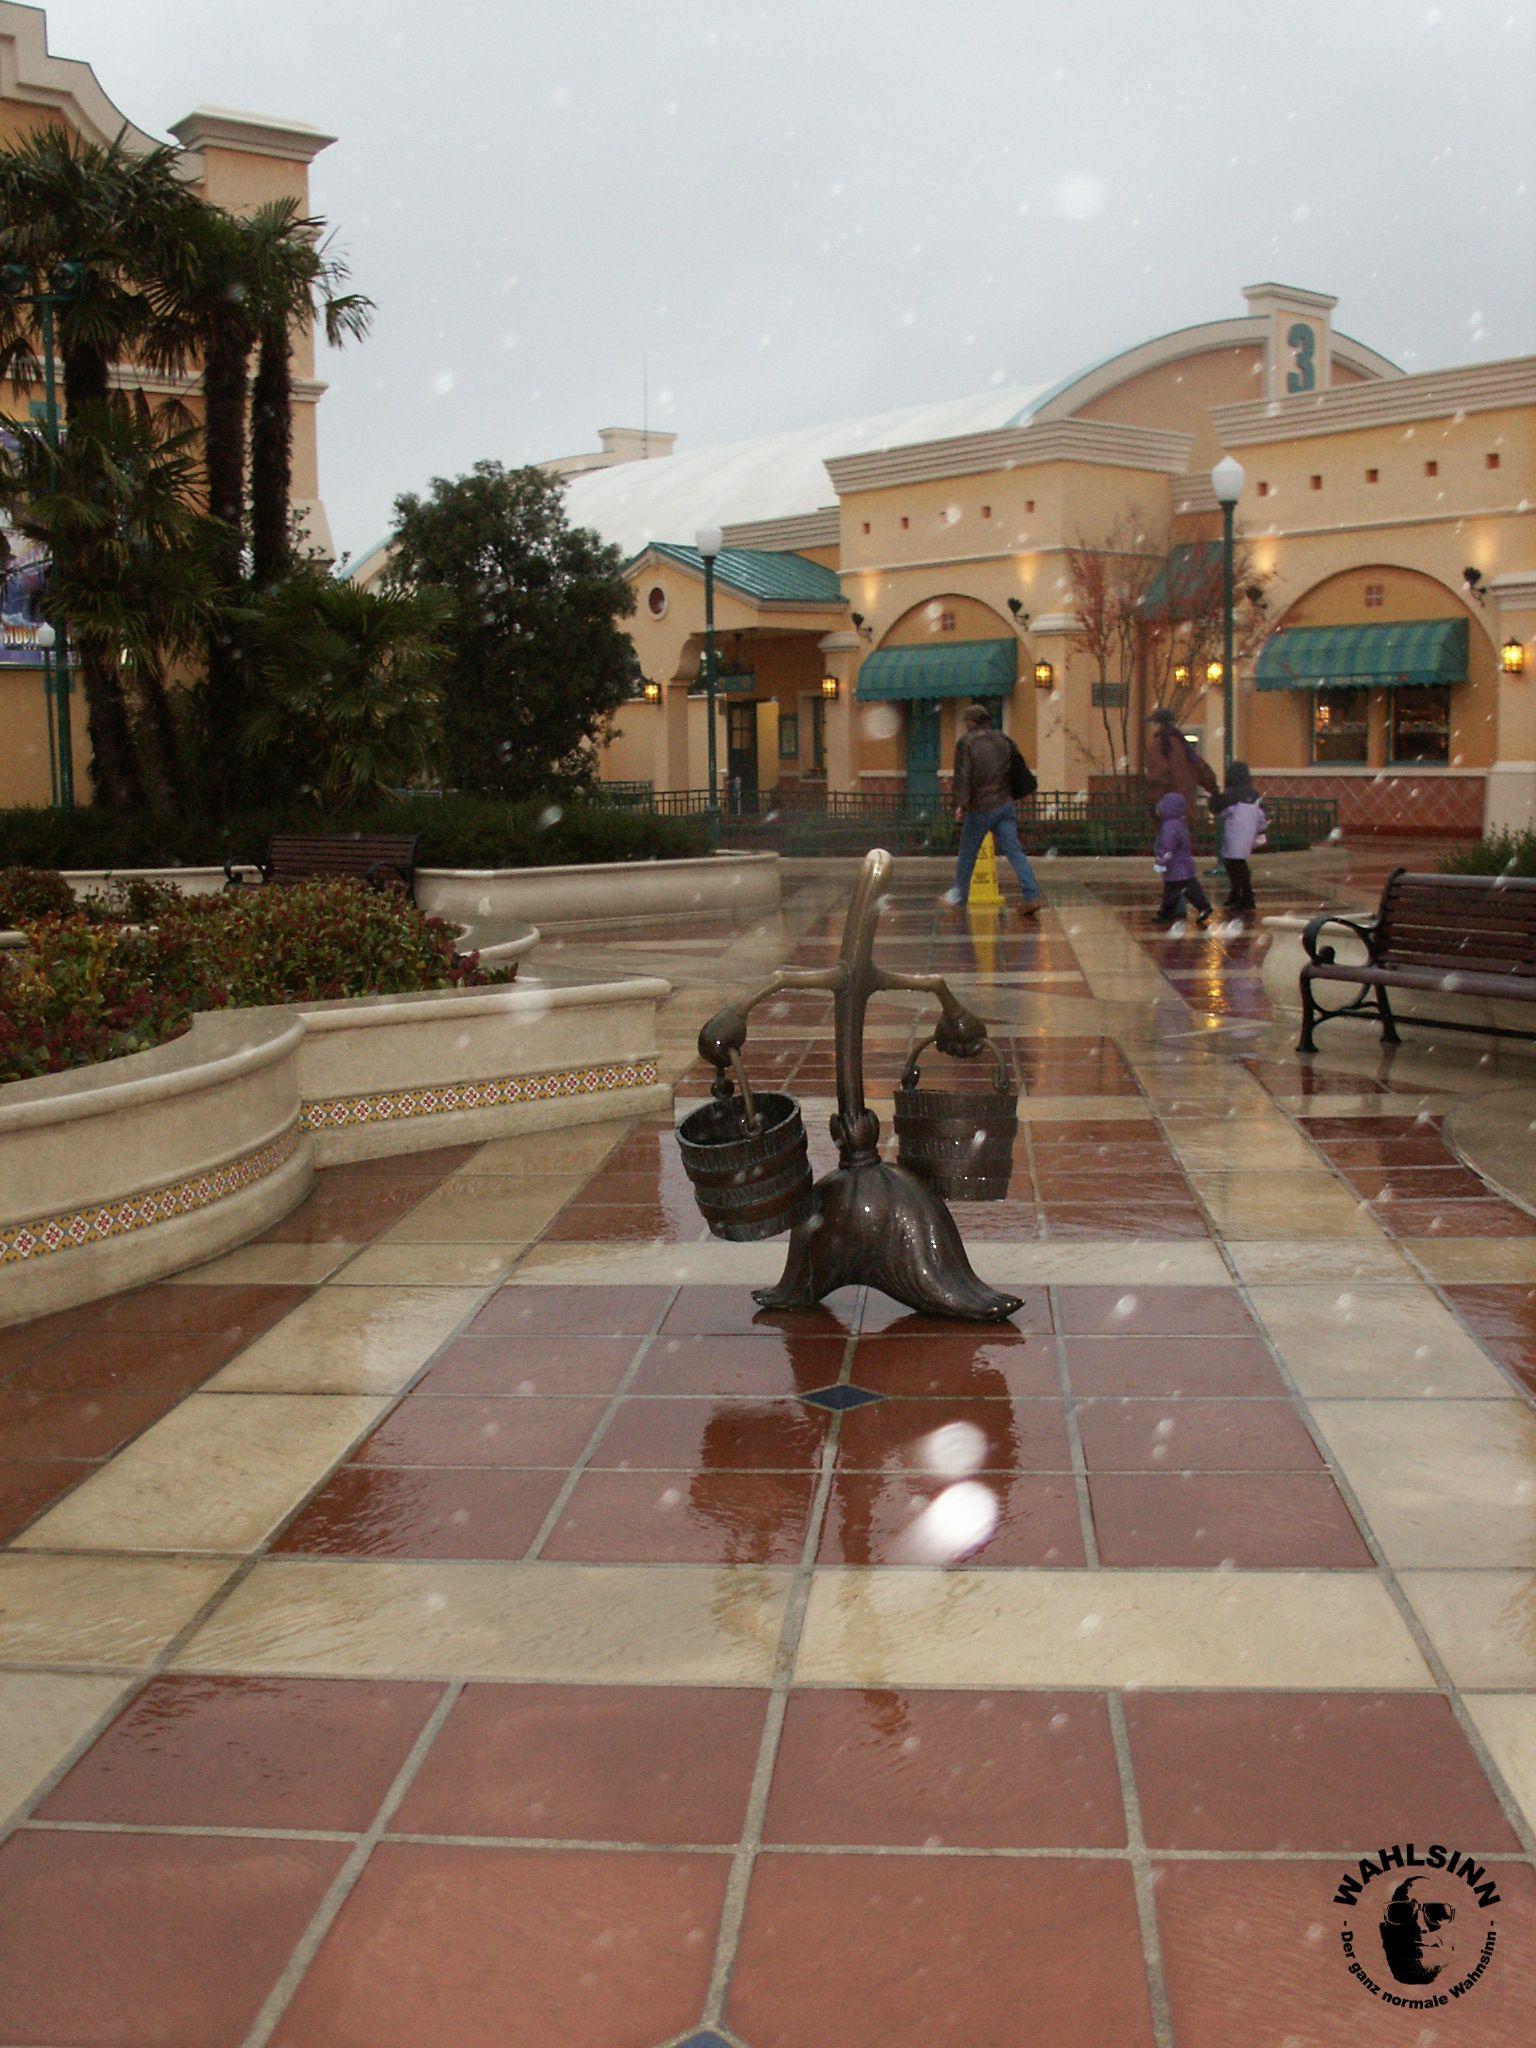 Disneyland Paris // Waöt Disney Studios - Eingangsbereich